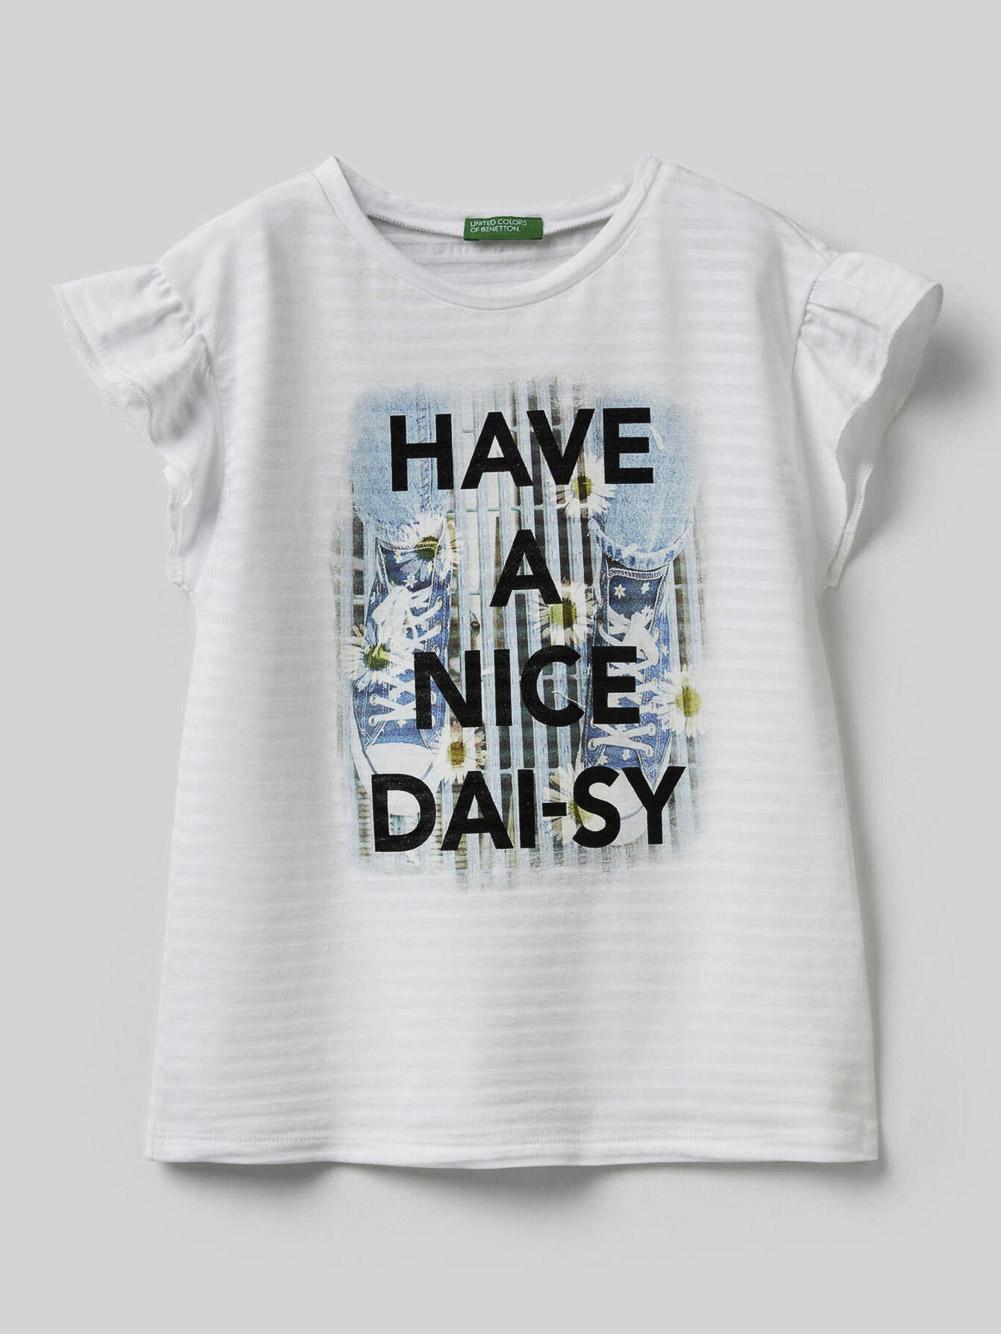 012 BENETTON Μπλούζα t-shirt 3F2HC14P2 20P101